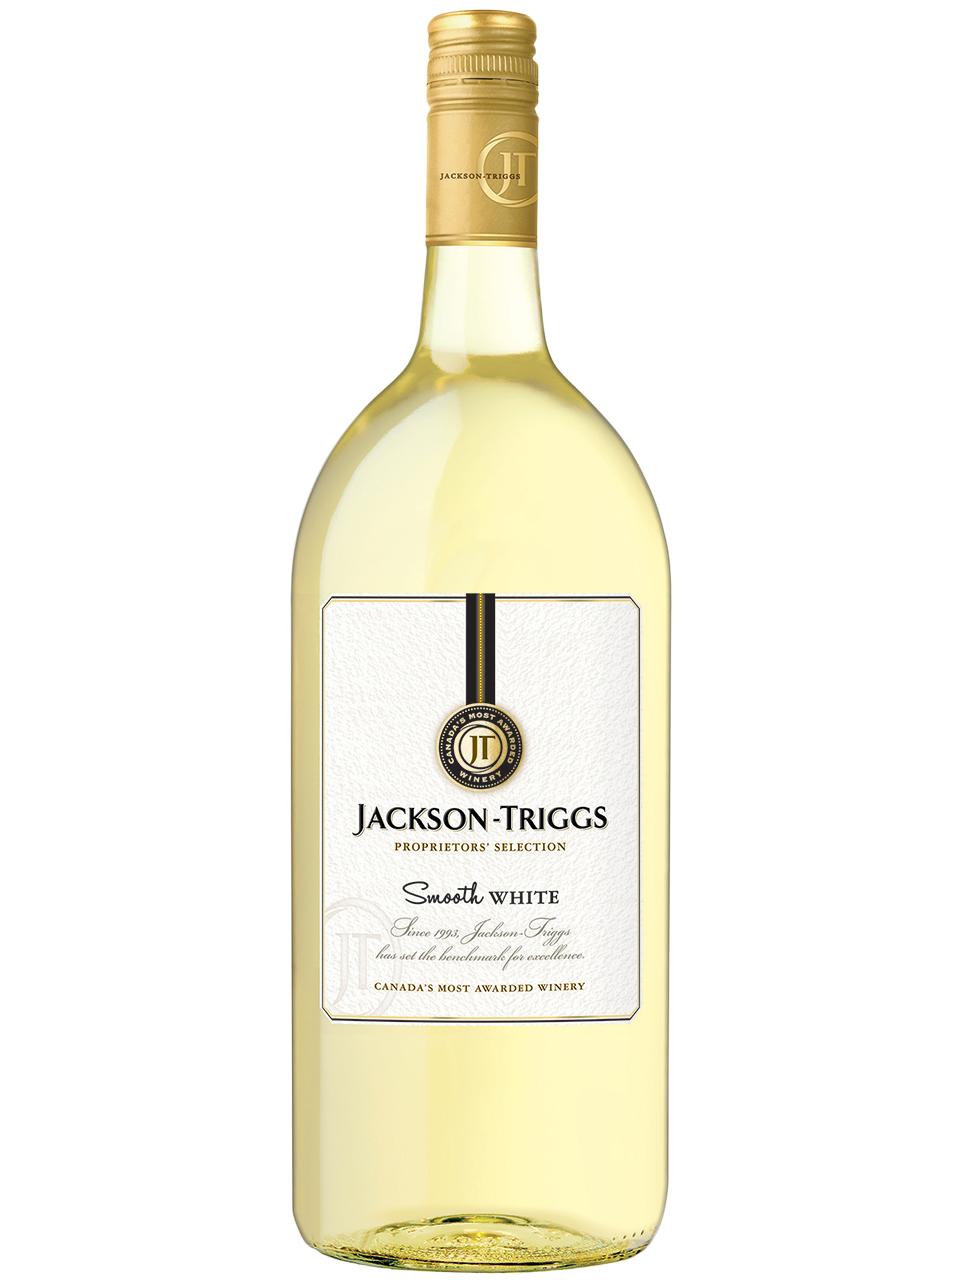 Jackson-Triggs Proprietors' Selection Smooth White